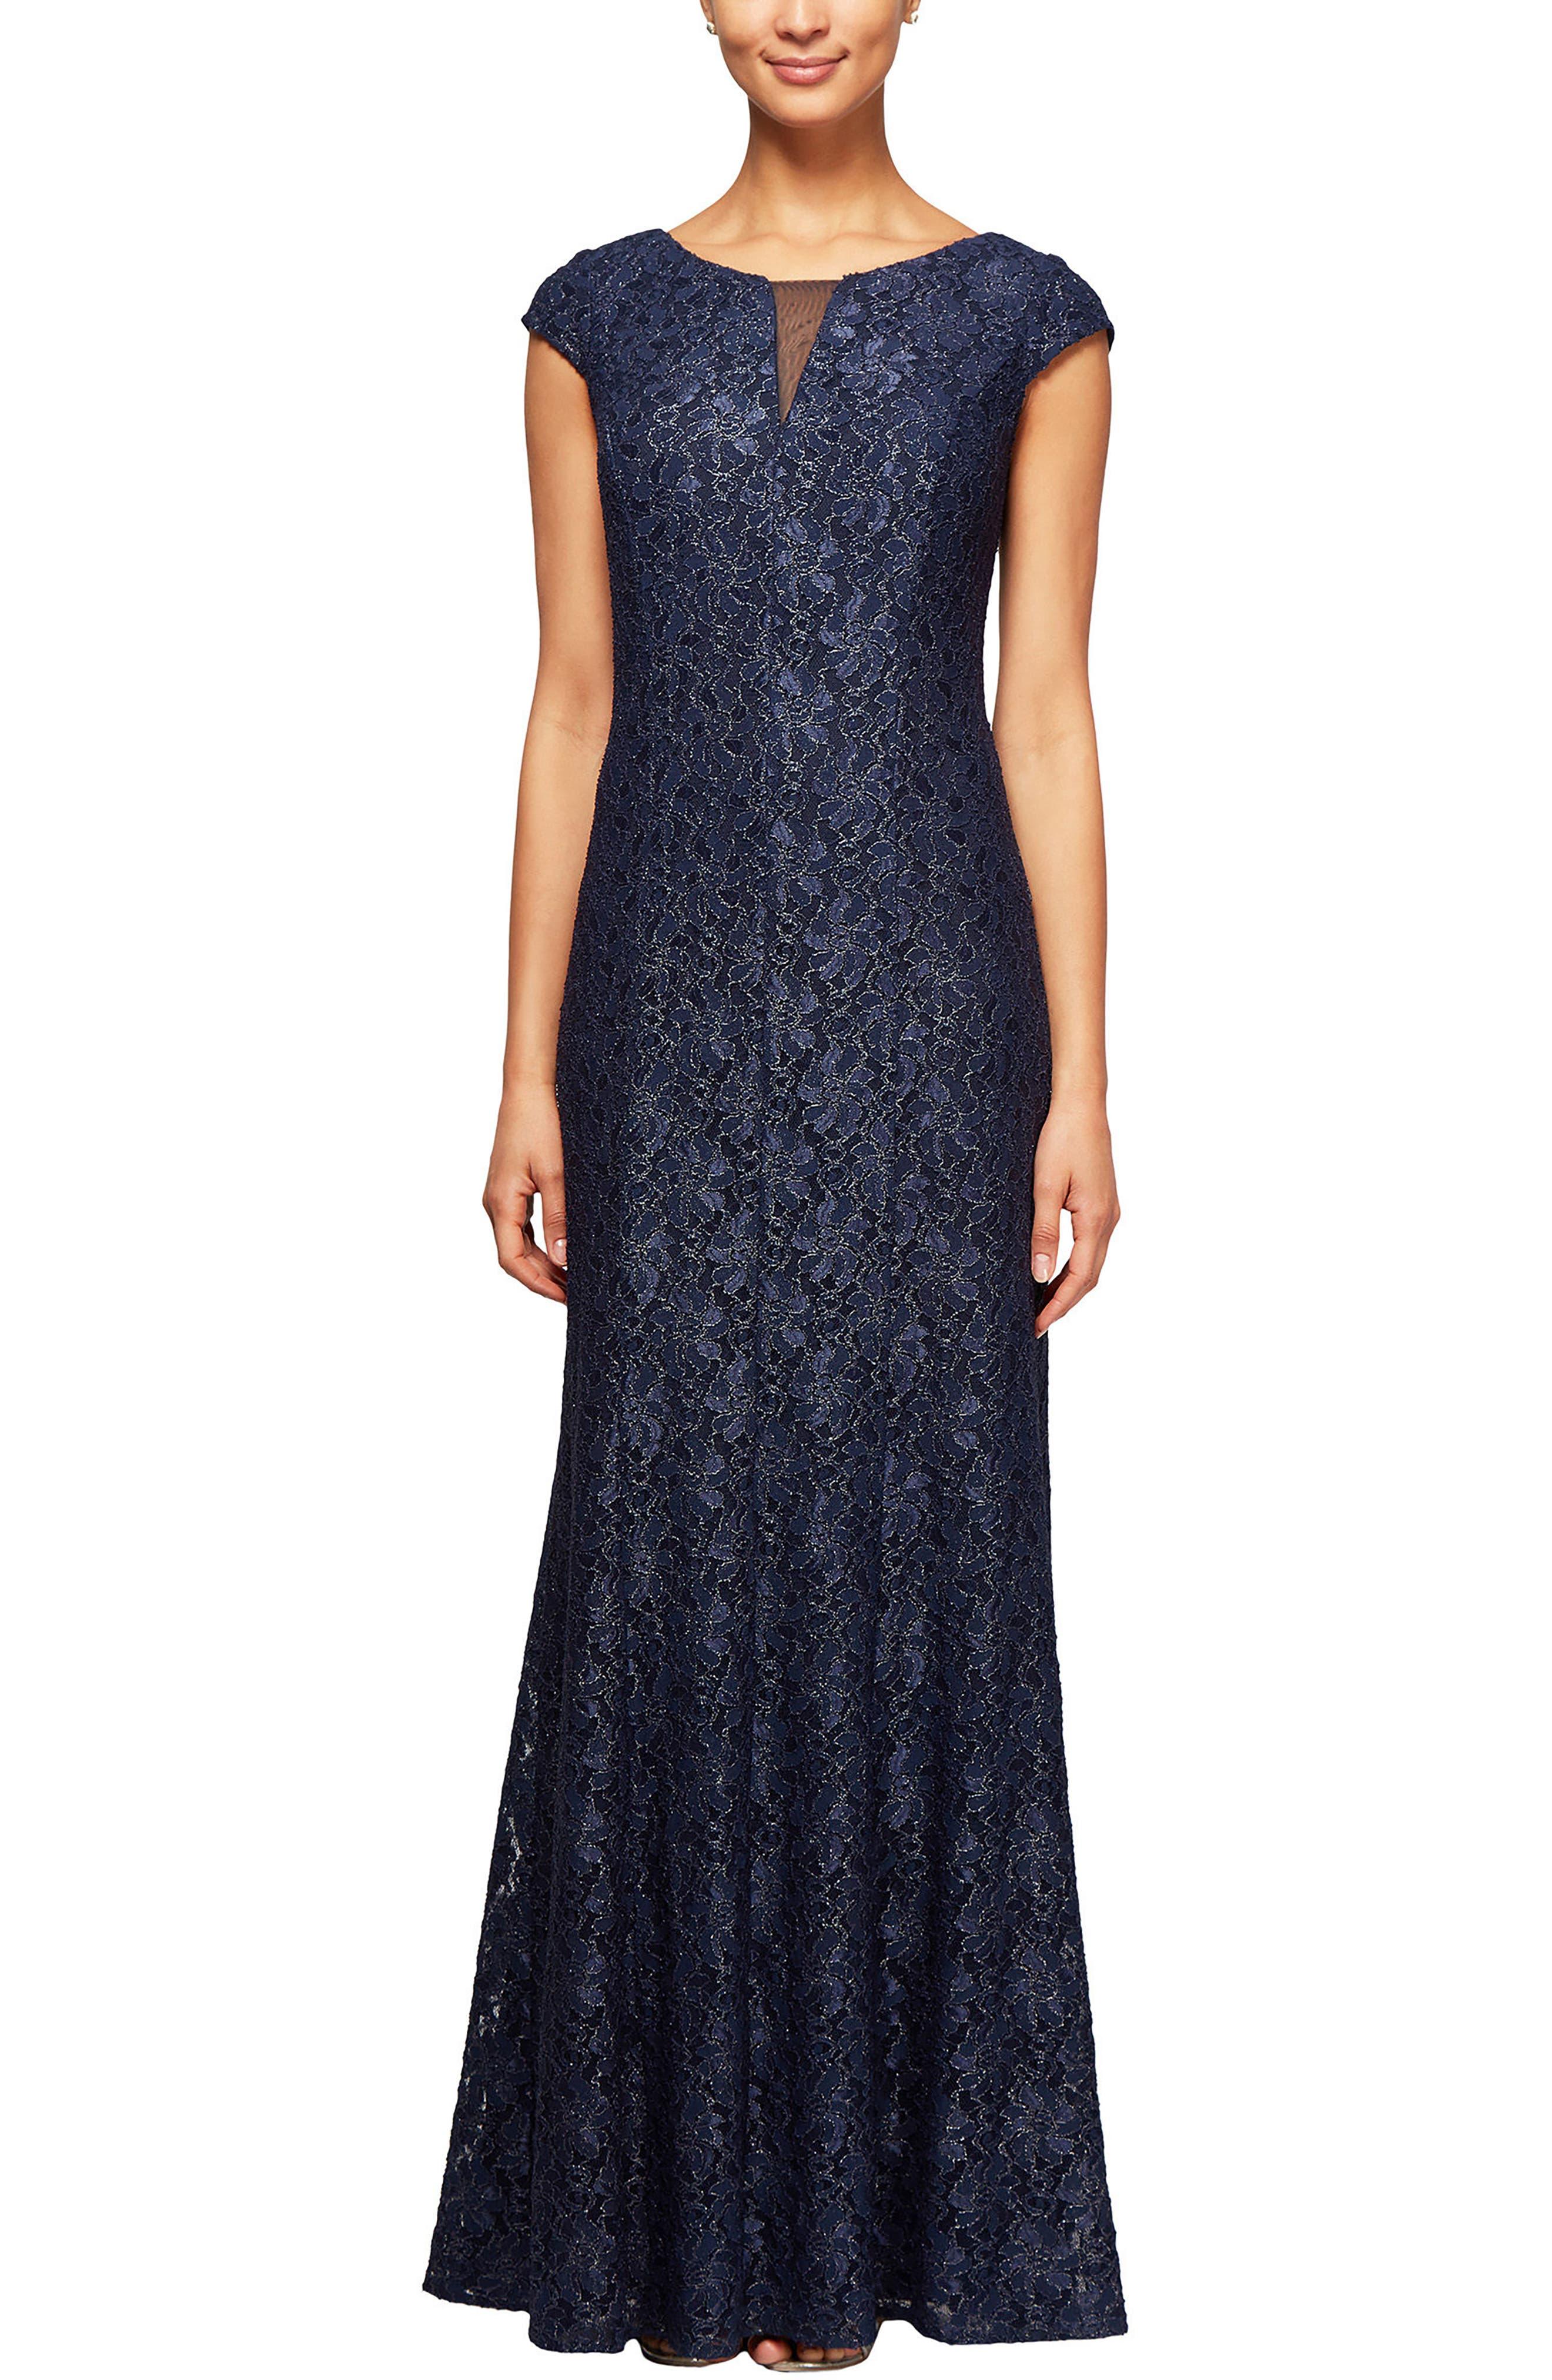 Main Image - Alex Evenings Metallic Lace A-Line Gown (Regular & Petite)